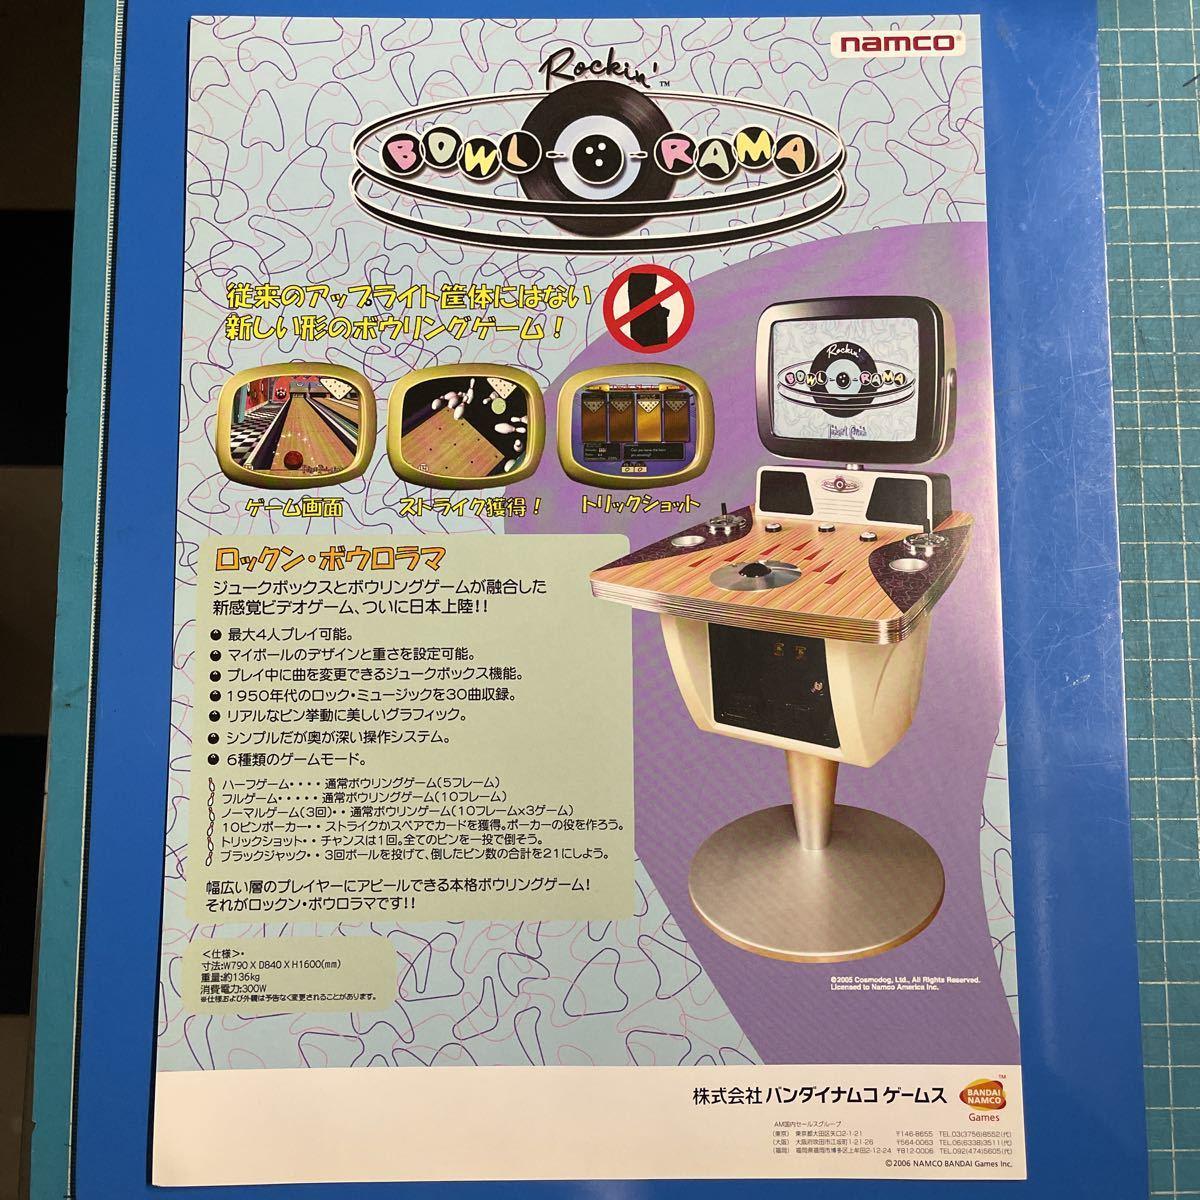 No.A22 アーケードゲーム BANDAI namco Rockんin BOWL RAMA 業務用 非売品 カタログ バンダイナムコ ゲームス ロックン・ボウロラマ_画像1